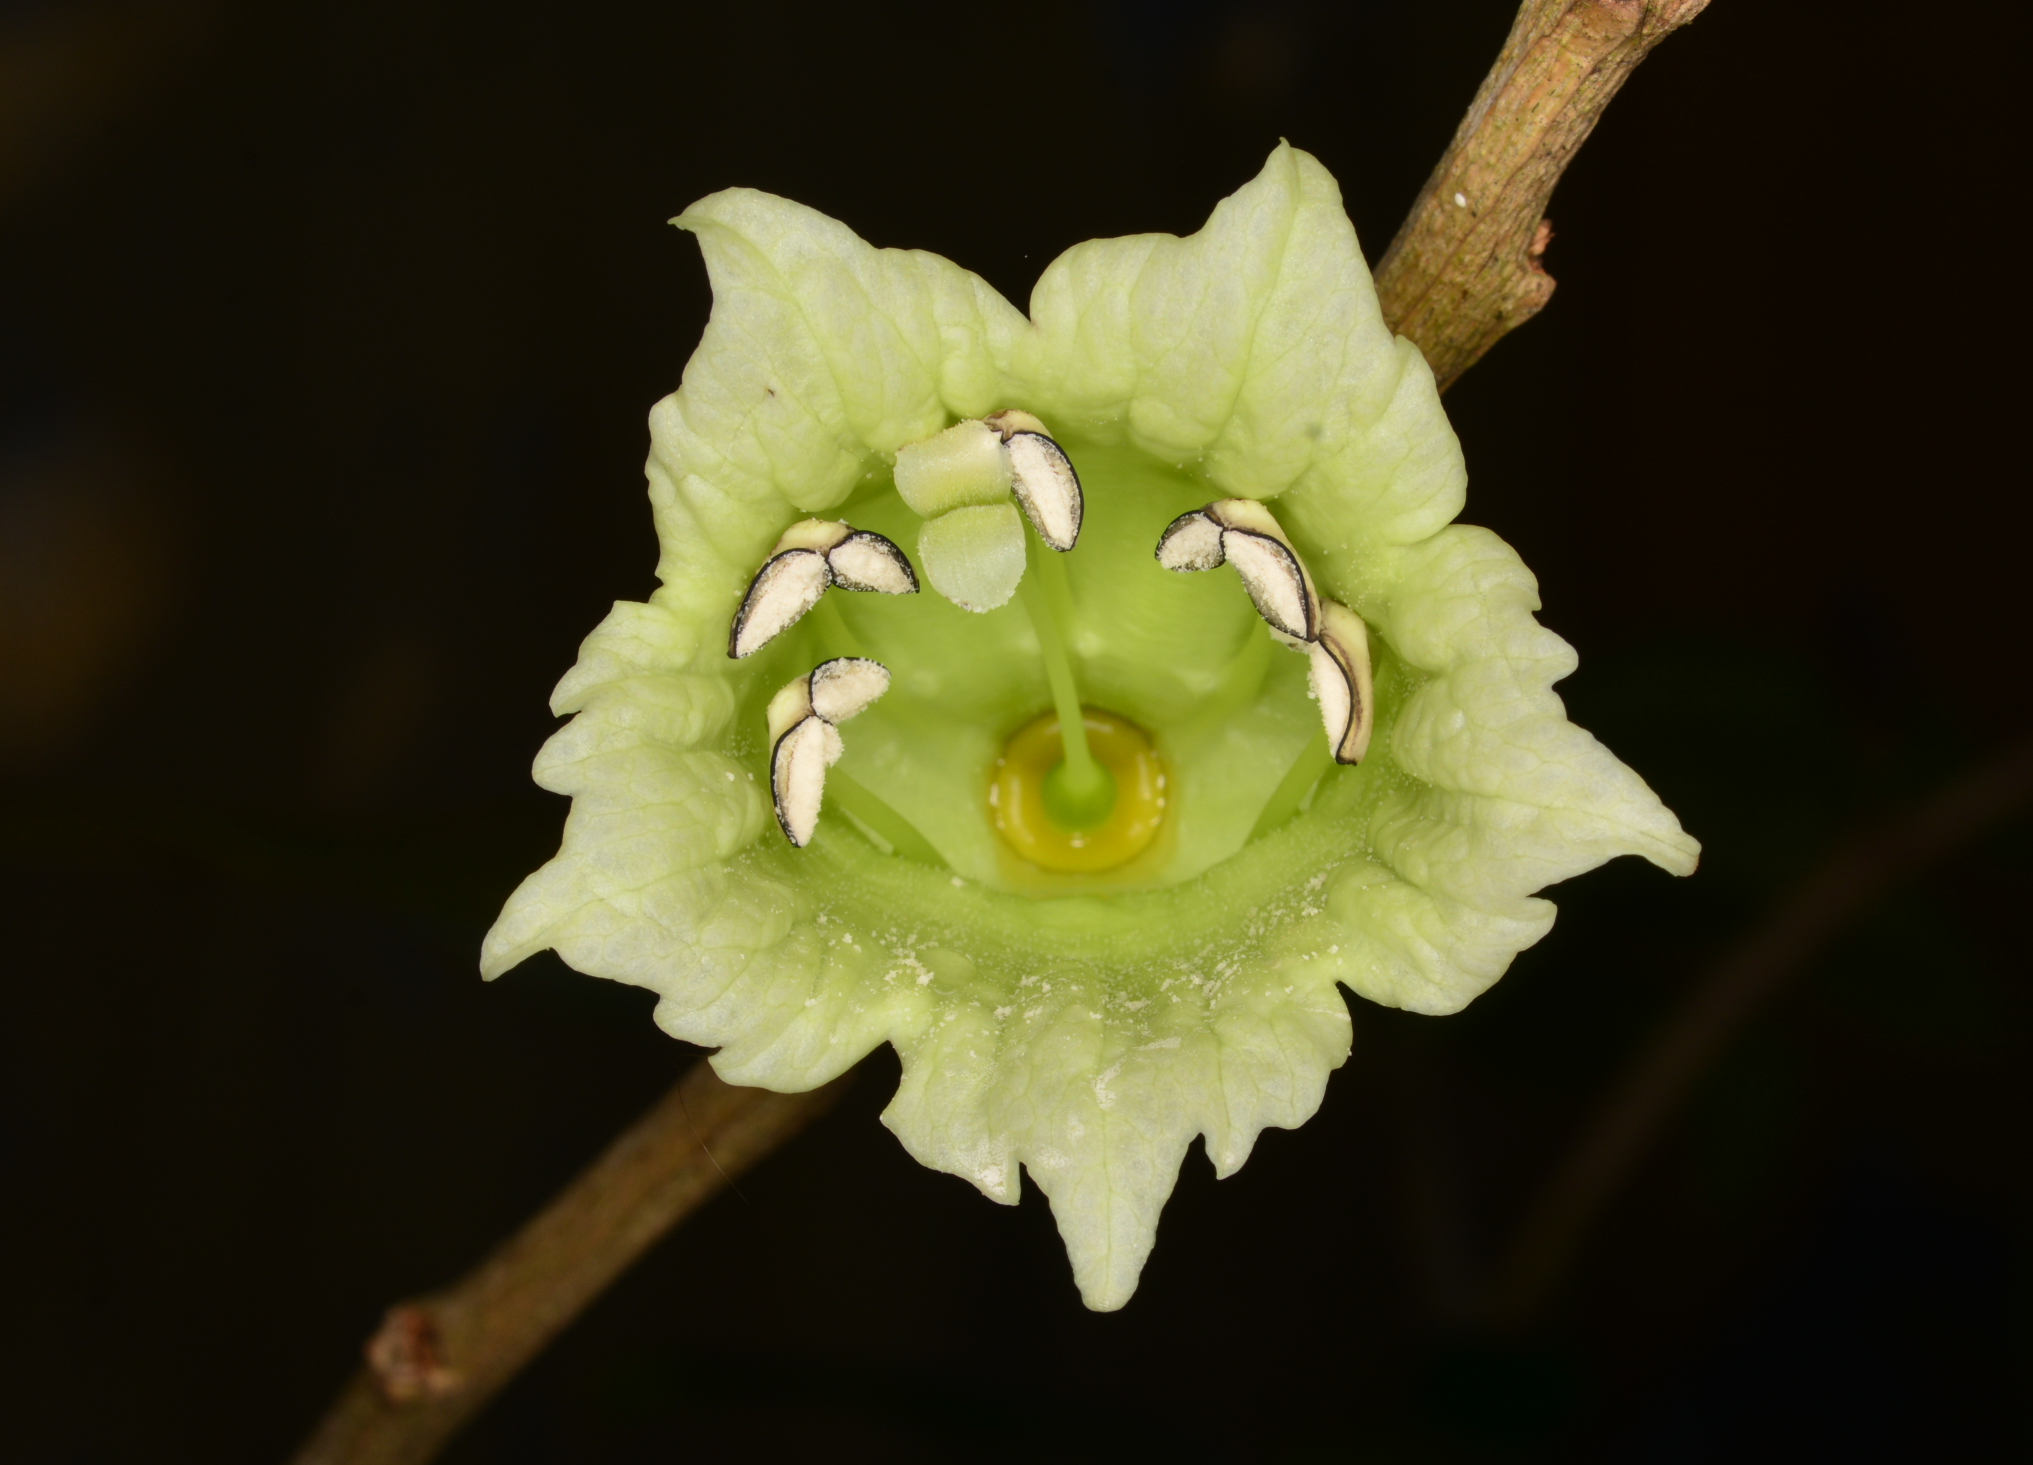 Flower of higuero de sierra (Crescentia portoricensis).